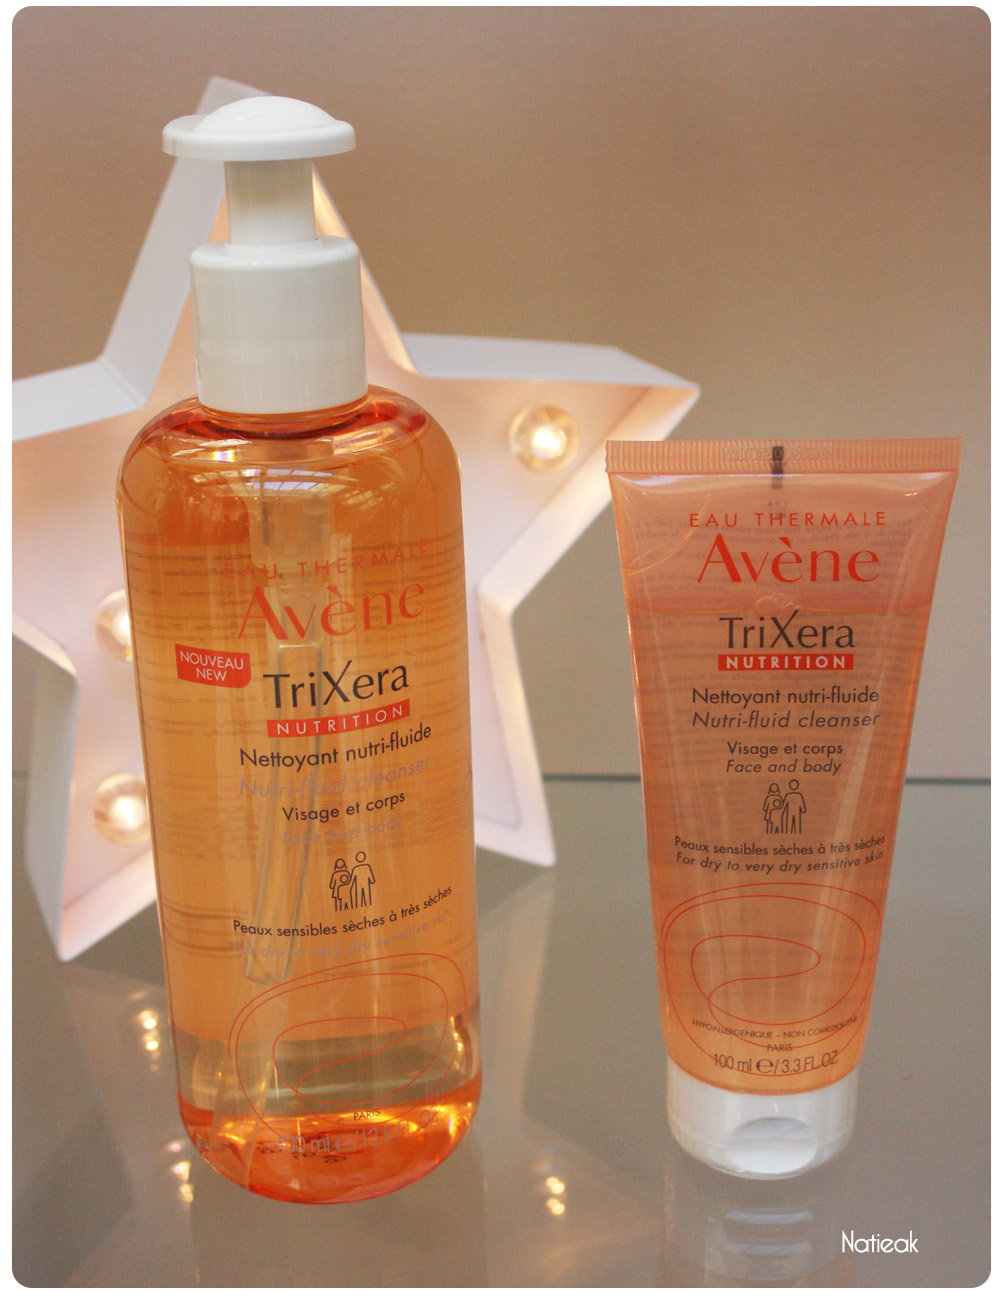 TriXera Nettoyant nutri-fluide format 400ml (13 €) et 100 ml (4 €)